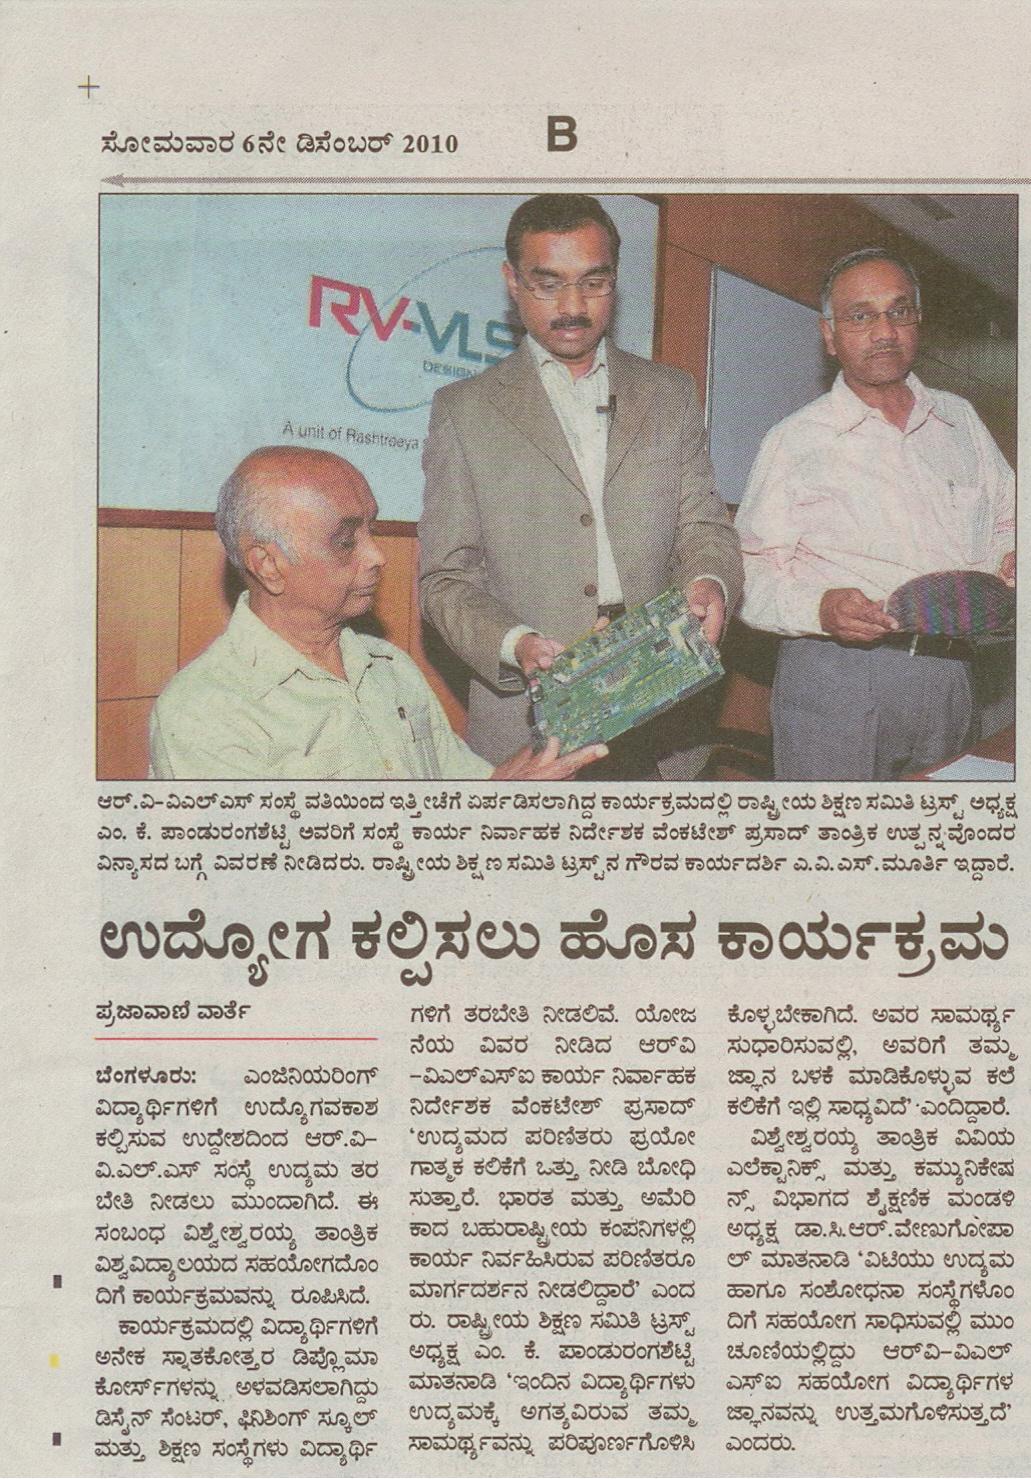 Dr. M K Panduranga Setty, President RV Education Group addressing a press conference along with Venkatesh Prasad founder CEO RV-VLSI and AVS Murthy Hon. Sec. RV Group